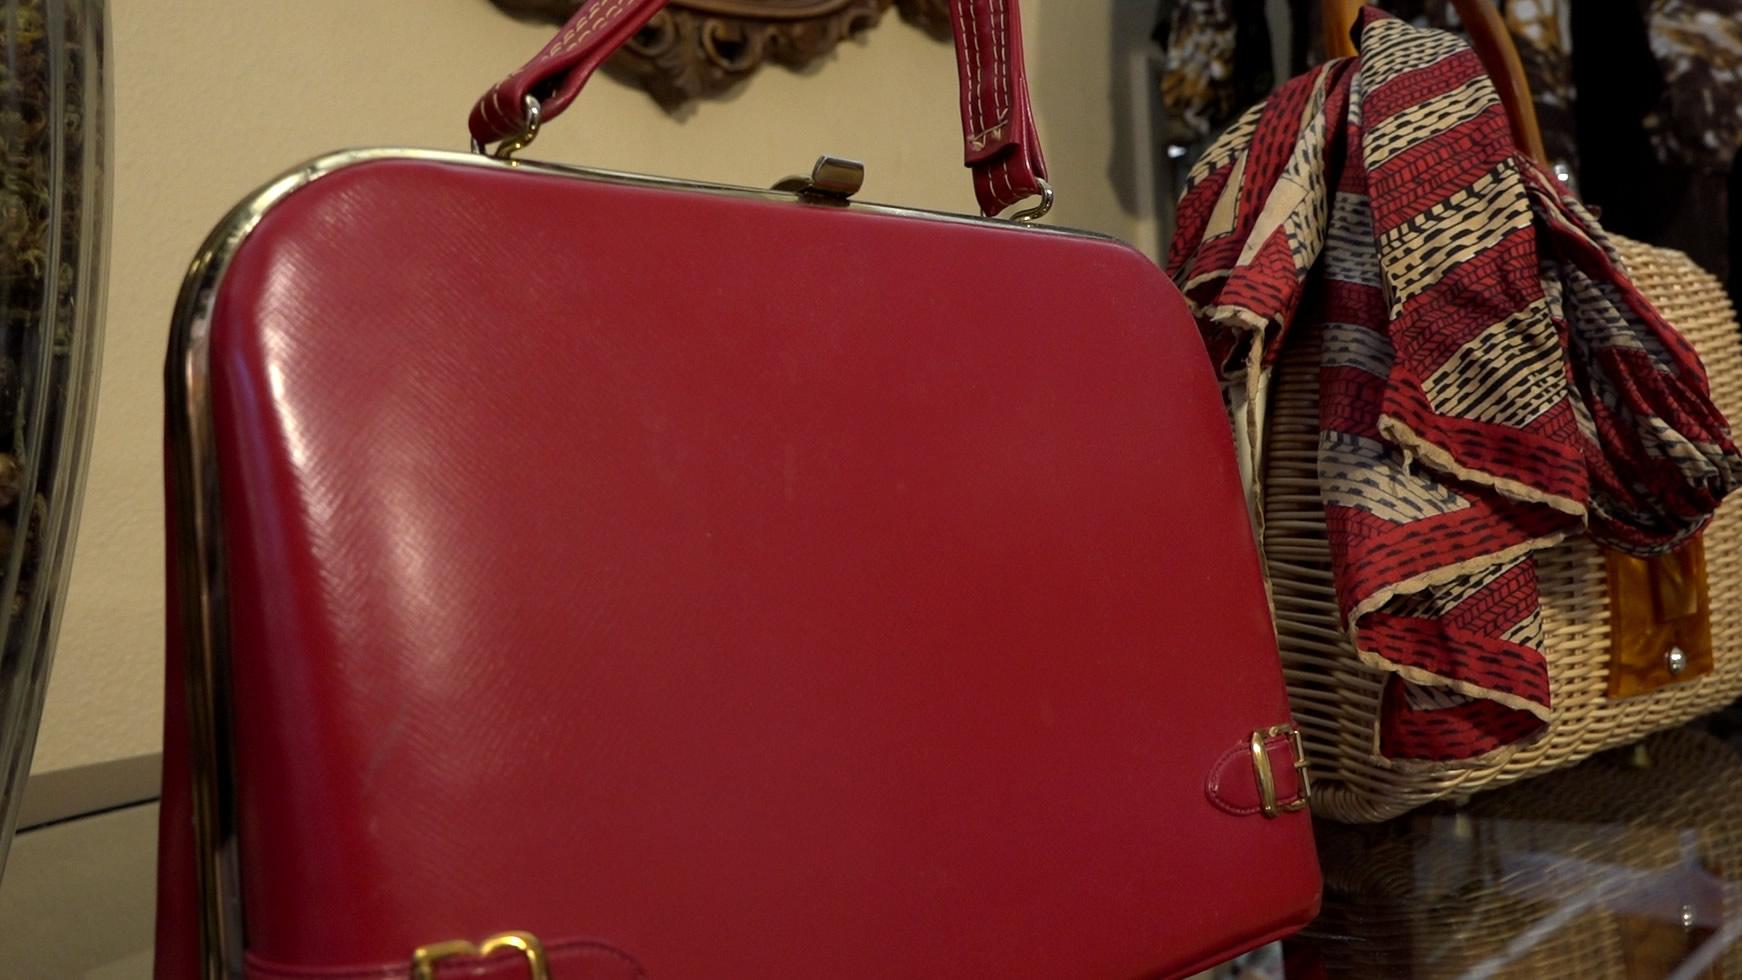 001 Red Bag.jpg